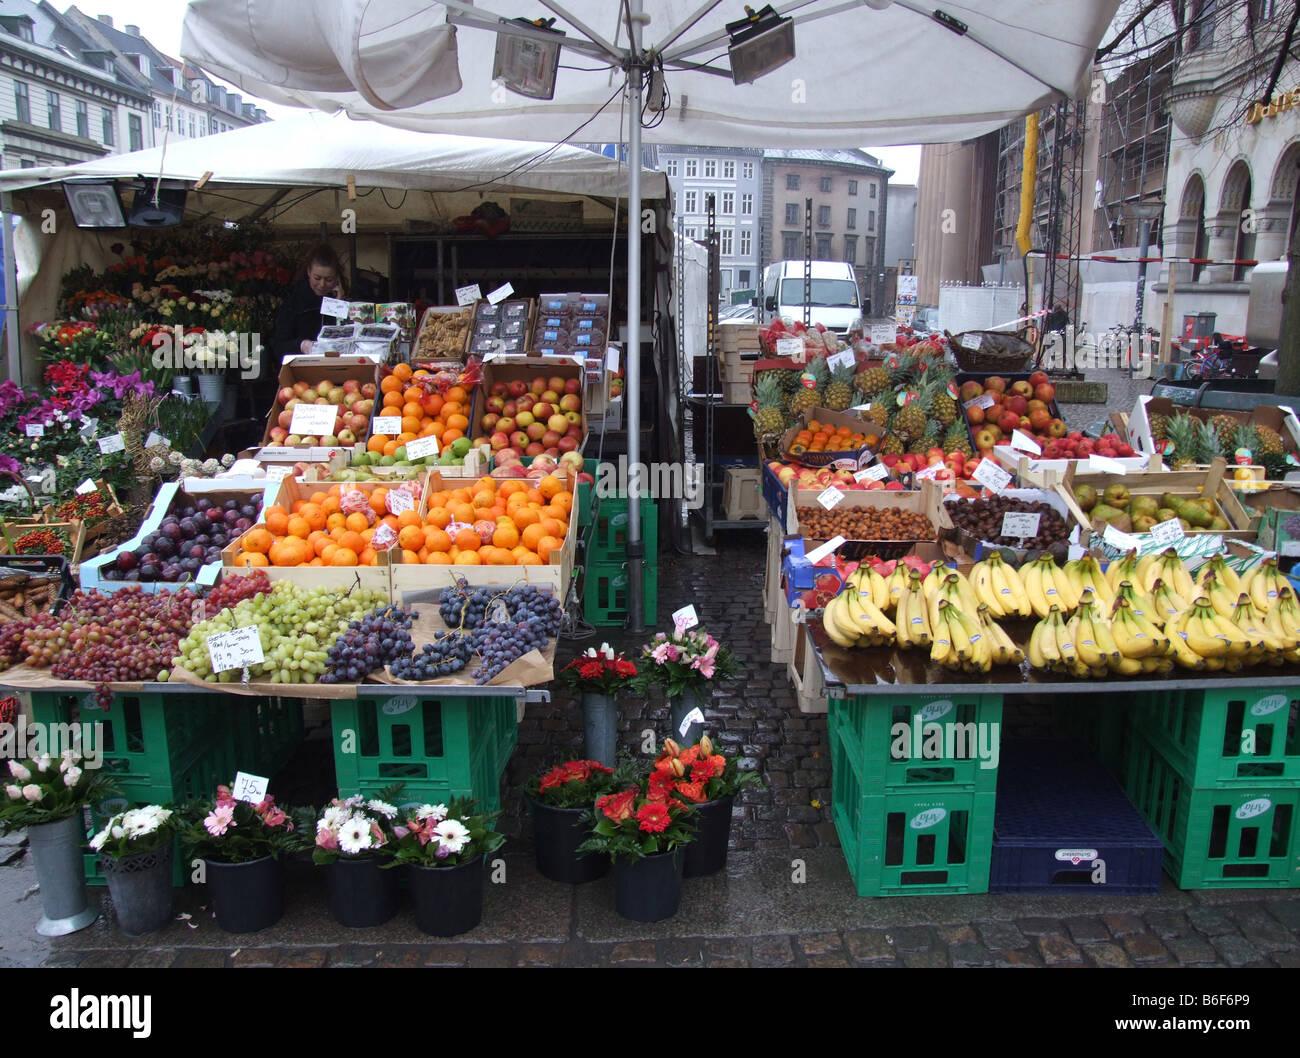 A market stall fruit and vegetables on Strøget in Copenhagen, Denmark. Strøget is the longest pedestrian - Stock Image